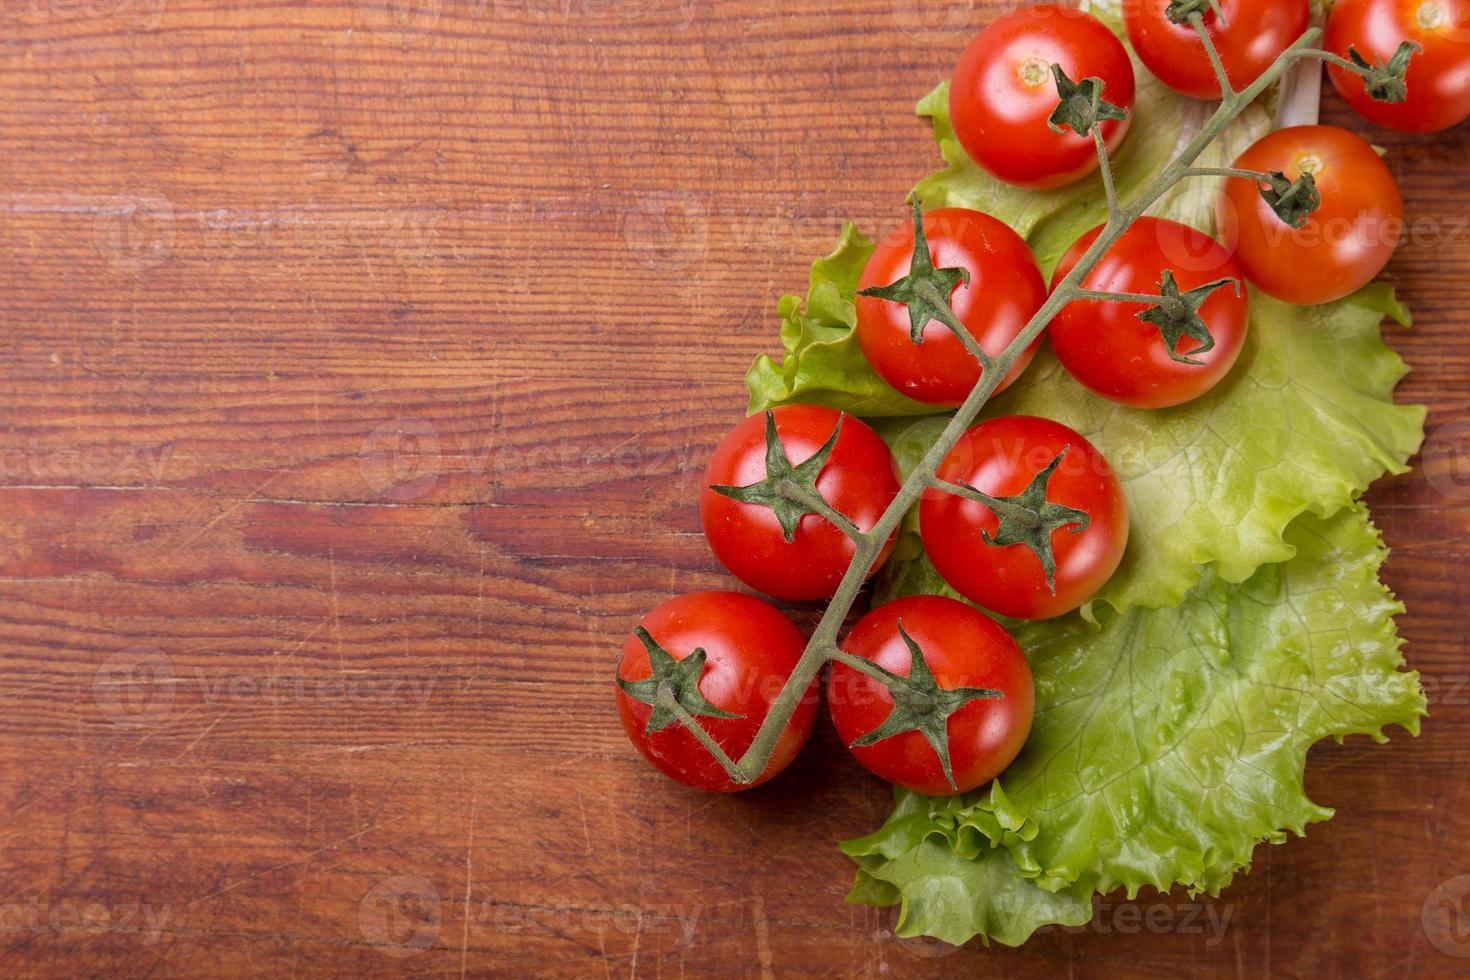 tomatfilial på vintage träbord foto